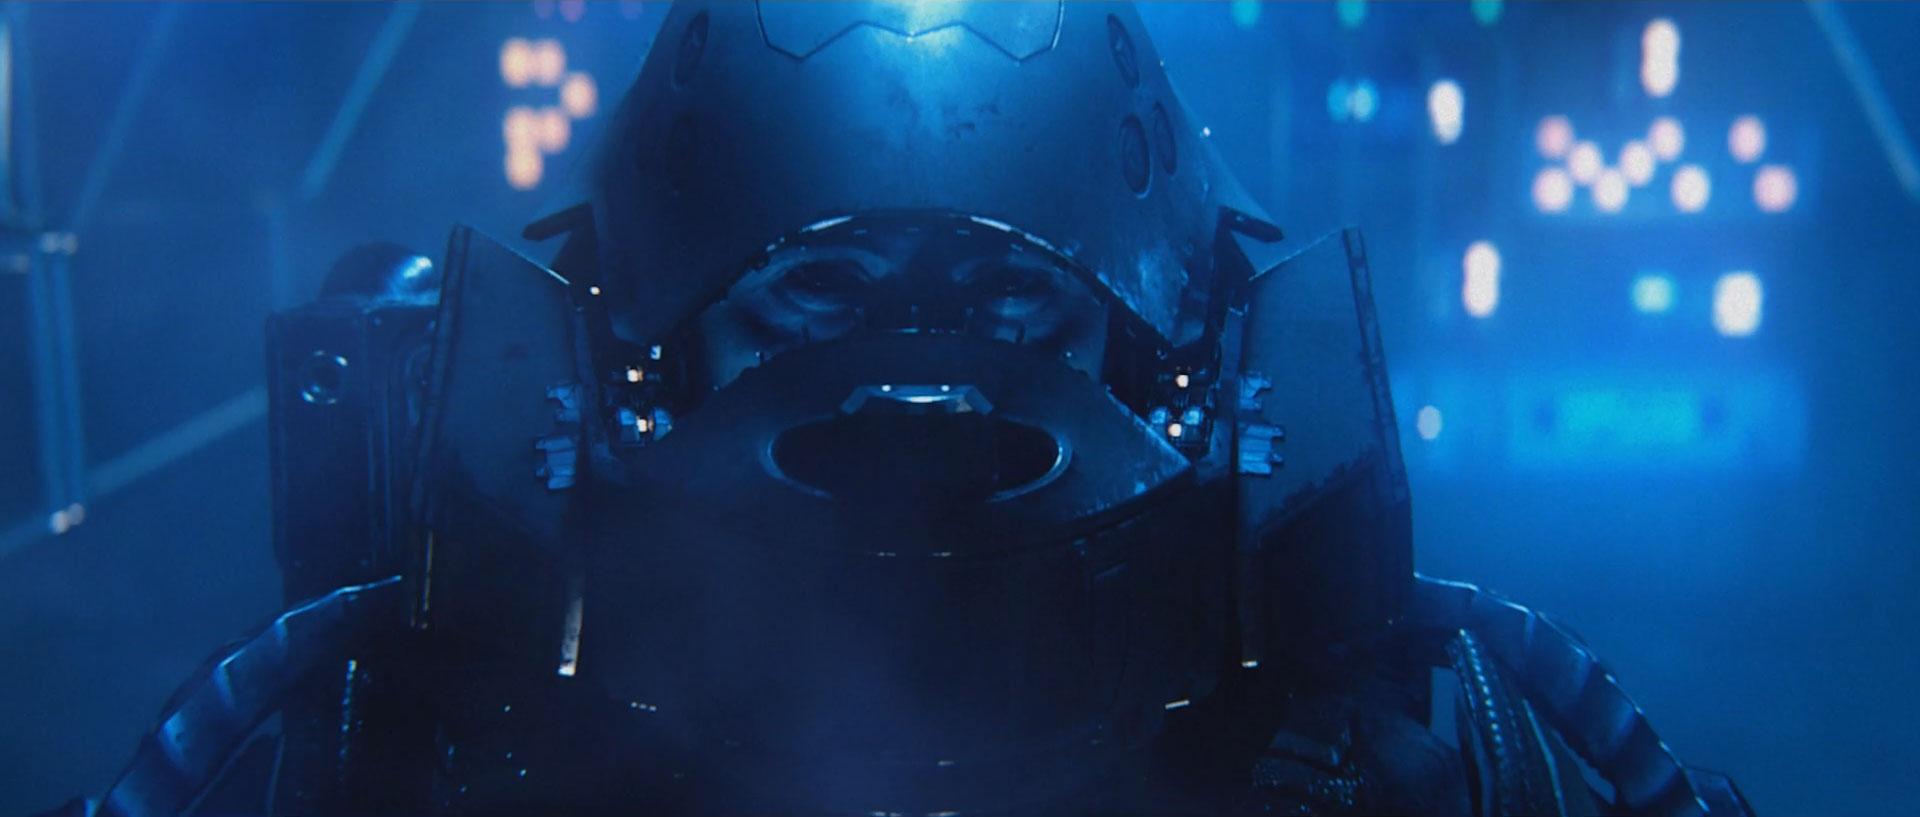 Keloid-Exoskeleton-Armor